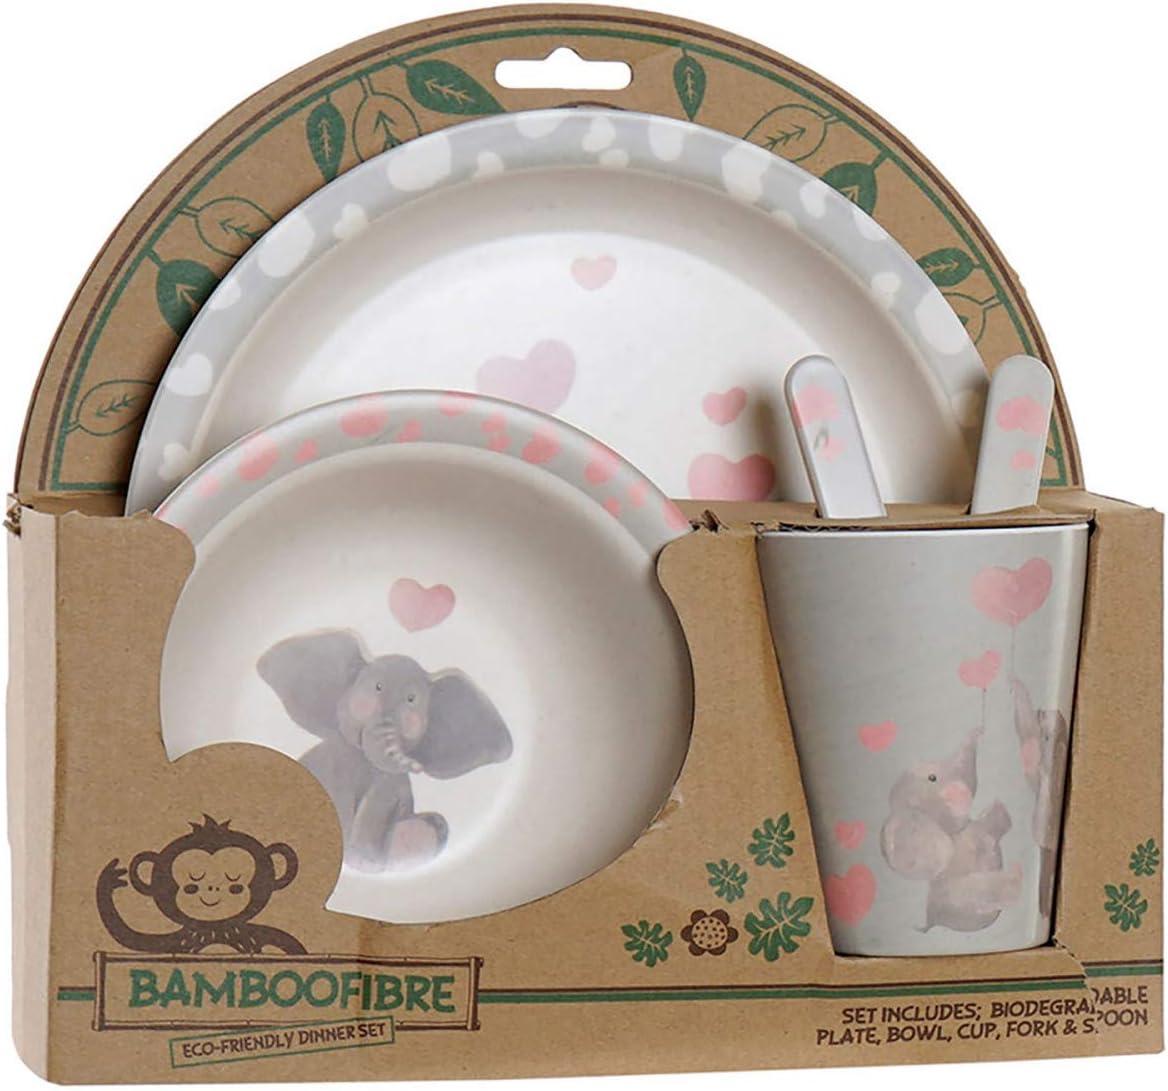 con Dise/ño de Elefante A Hogar y Mas Vajilla Infantil de Bamb/ú Set de 5 Productos 25x9,5x24 cm